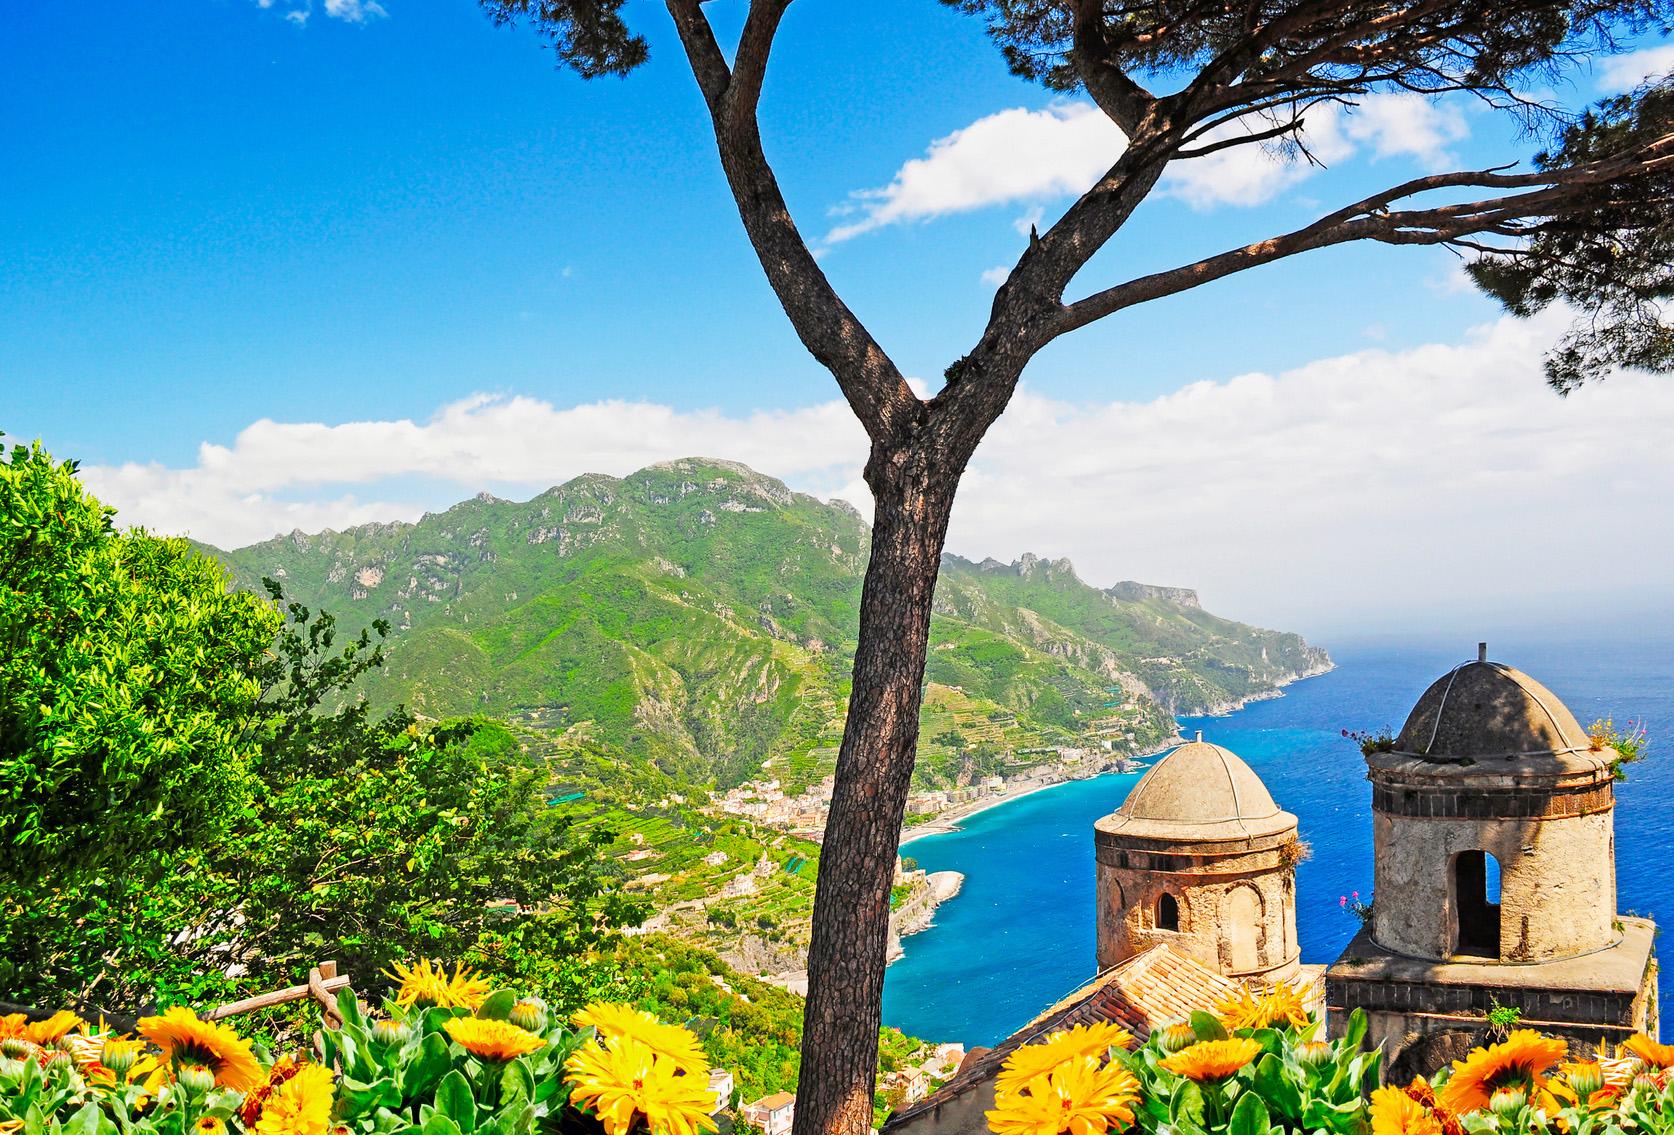 amalfiküste capri ischia golf von neapel